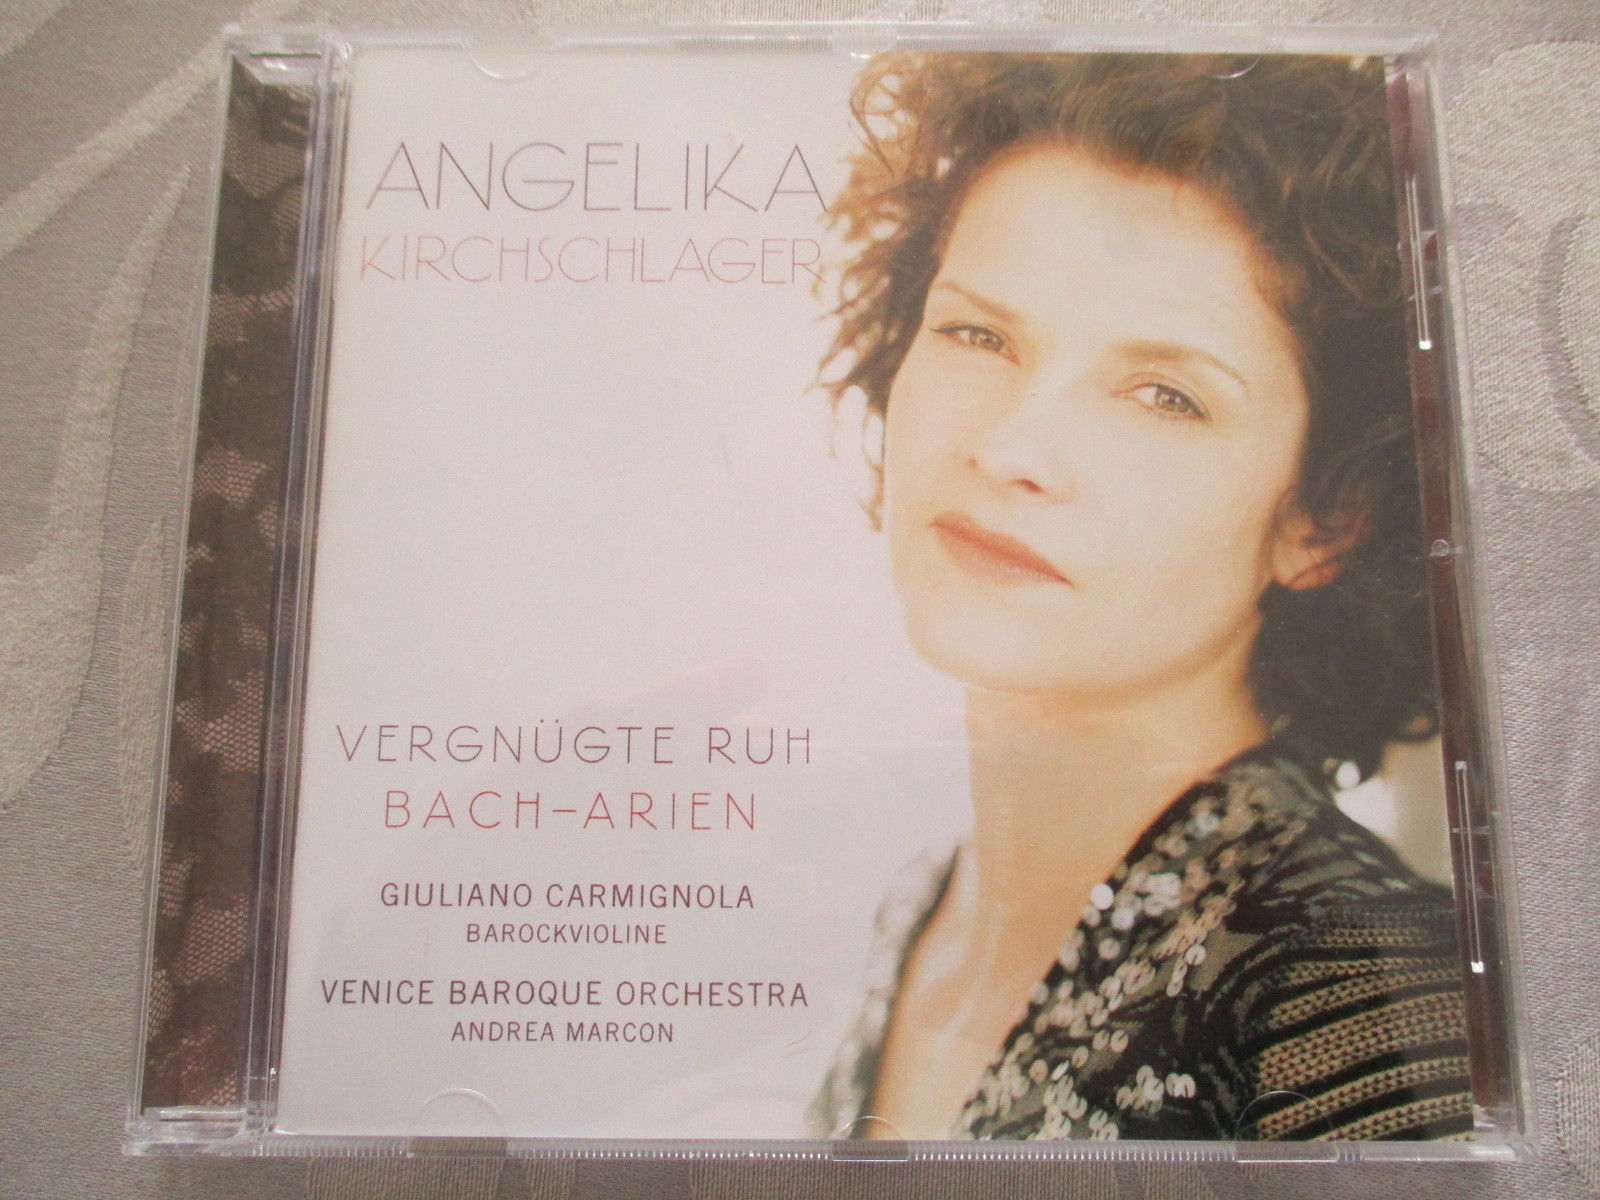 Angelika Kirchschlager - Vergnügte Ruh - Bach-Arien - CD